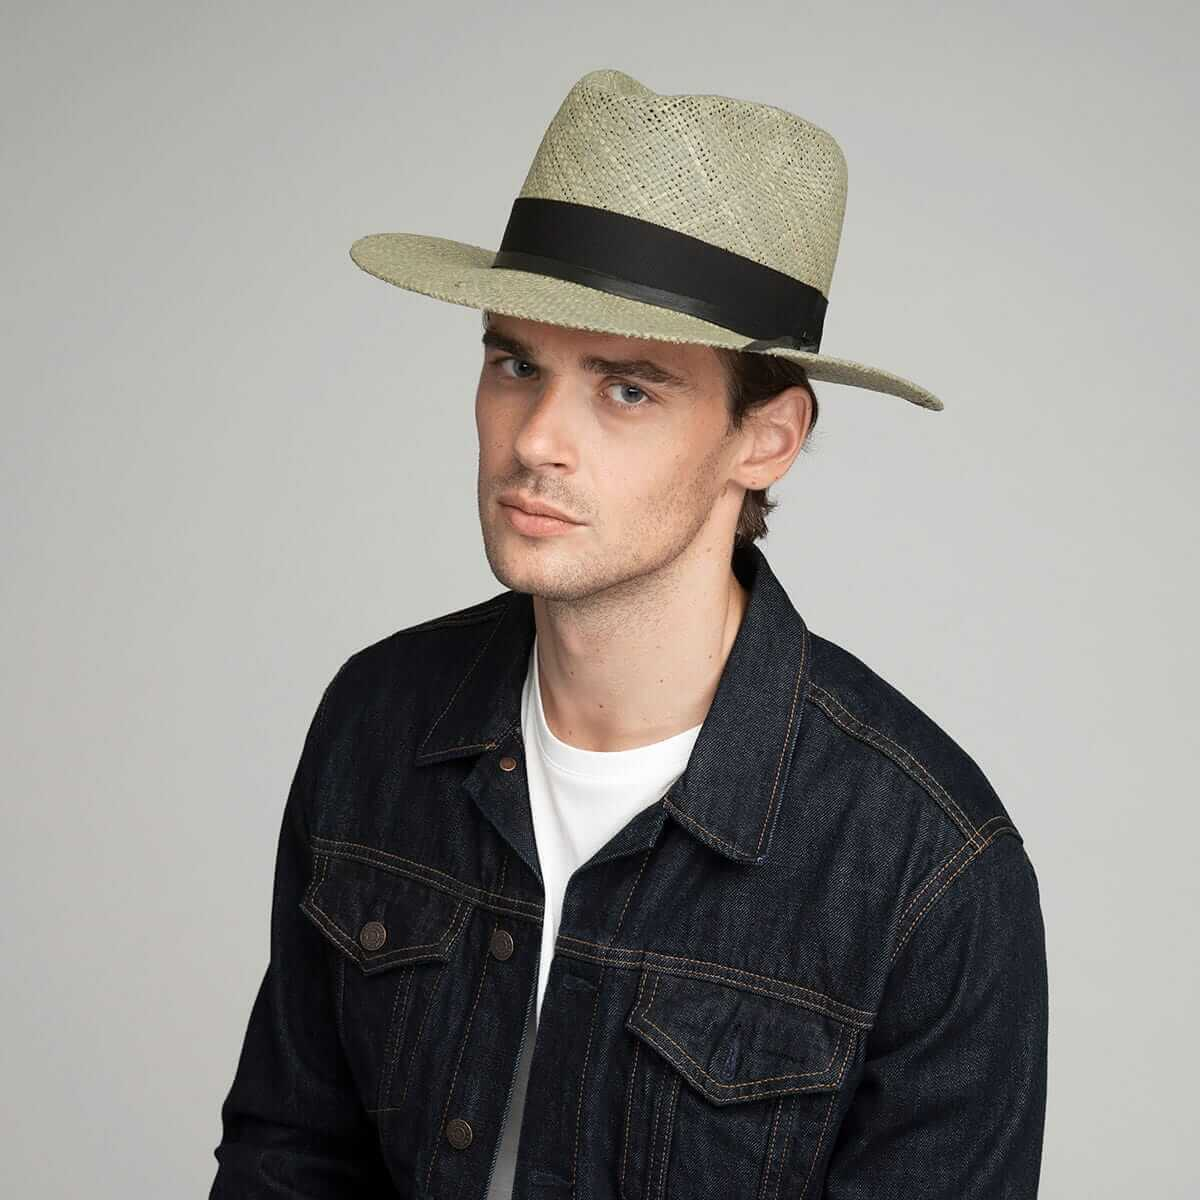 men's spring fedora hat